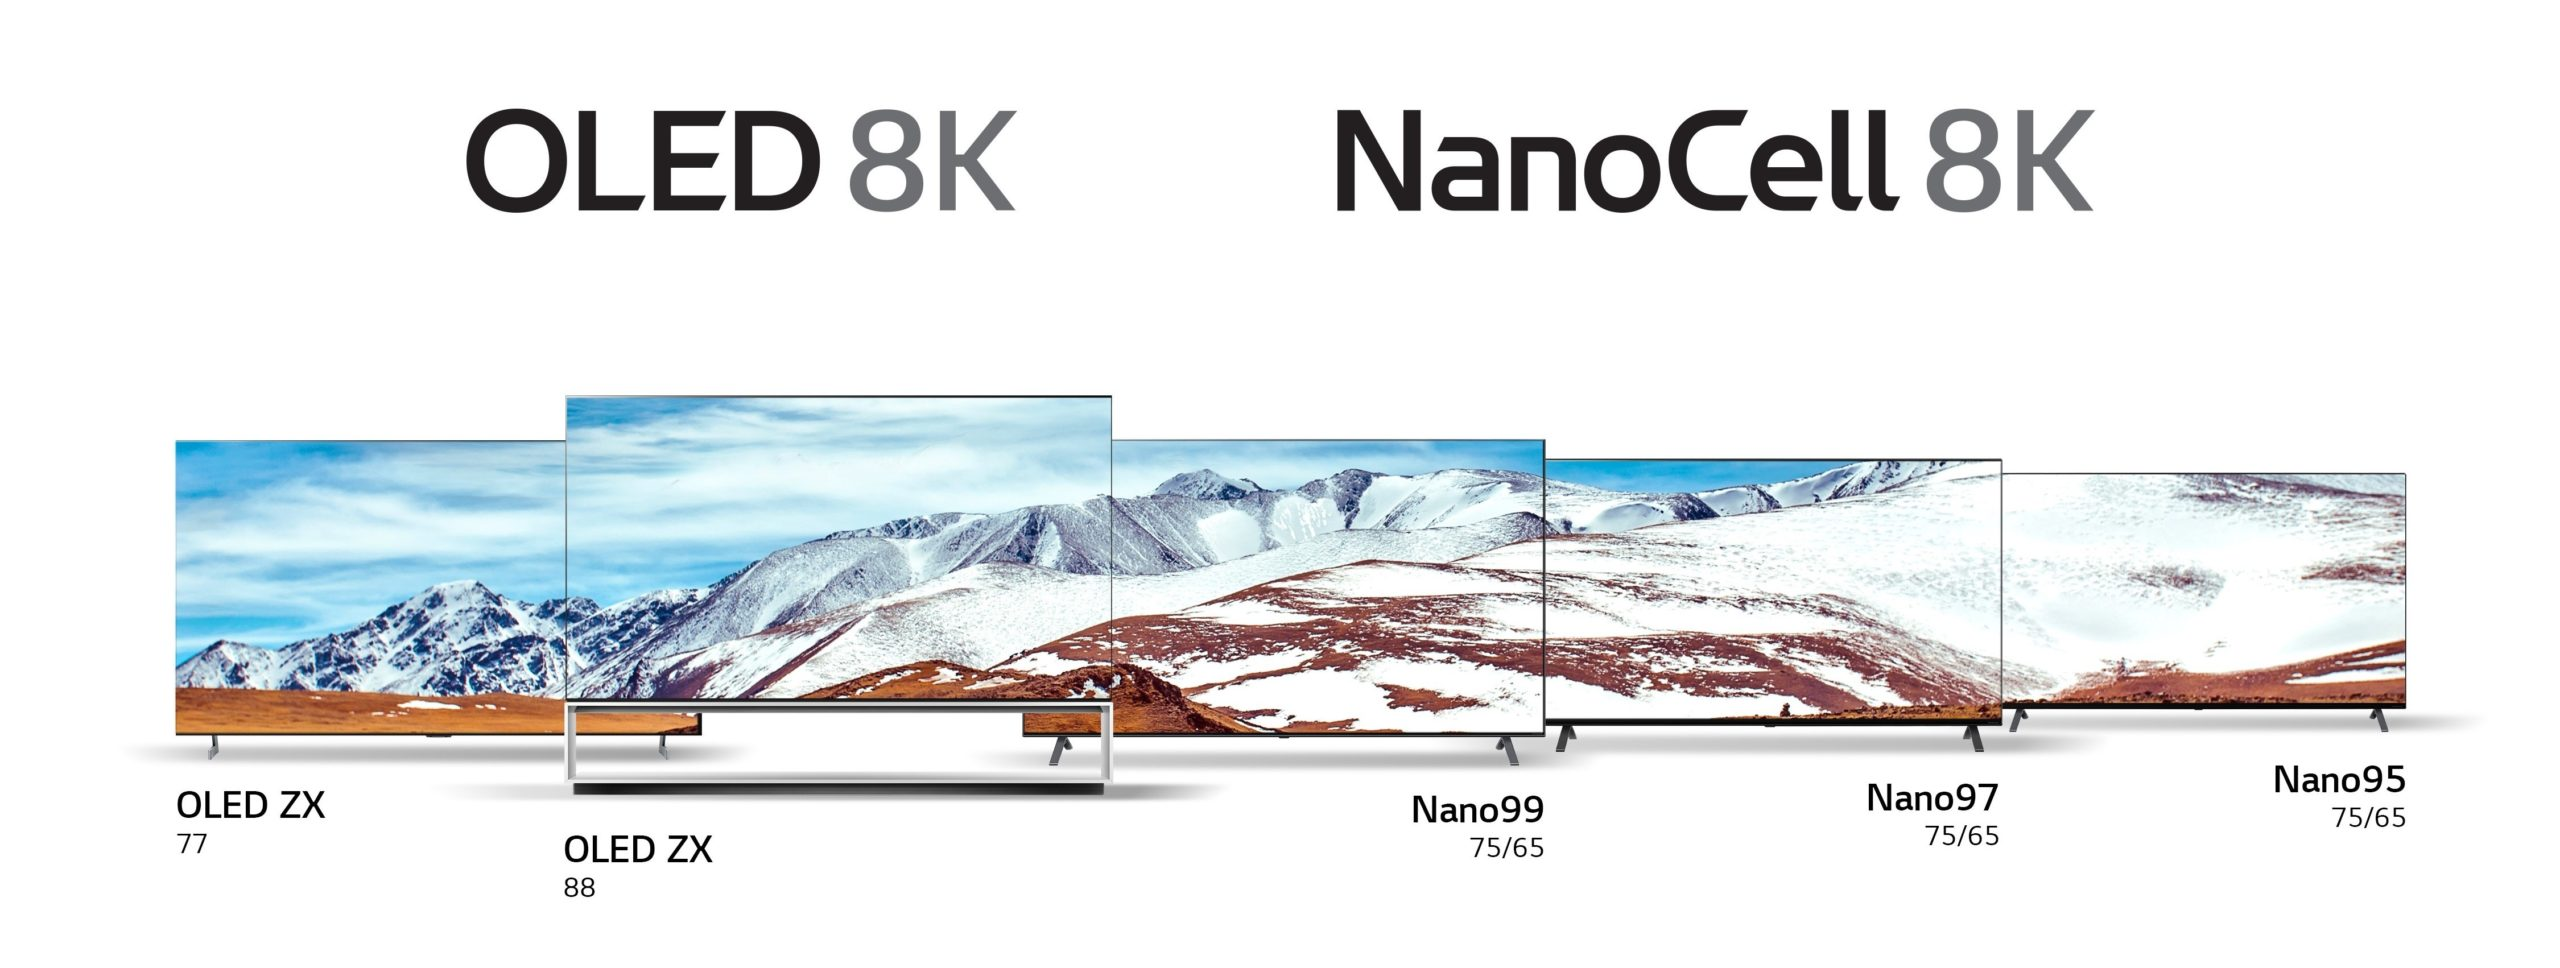 Avec plusieurs modèles offerts par LG, le UltraHD 8K prendra son envol en 2020